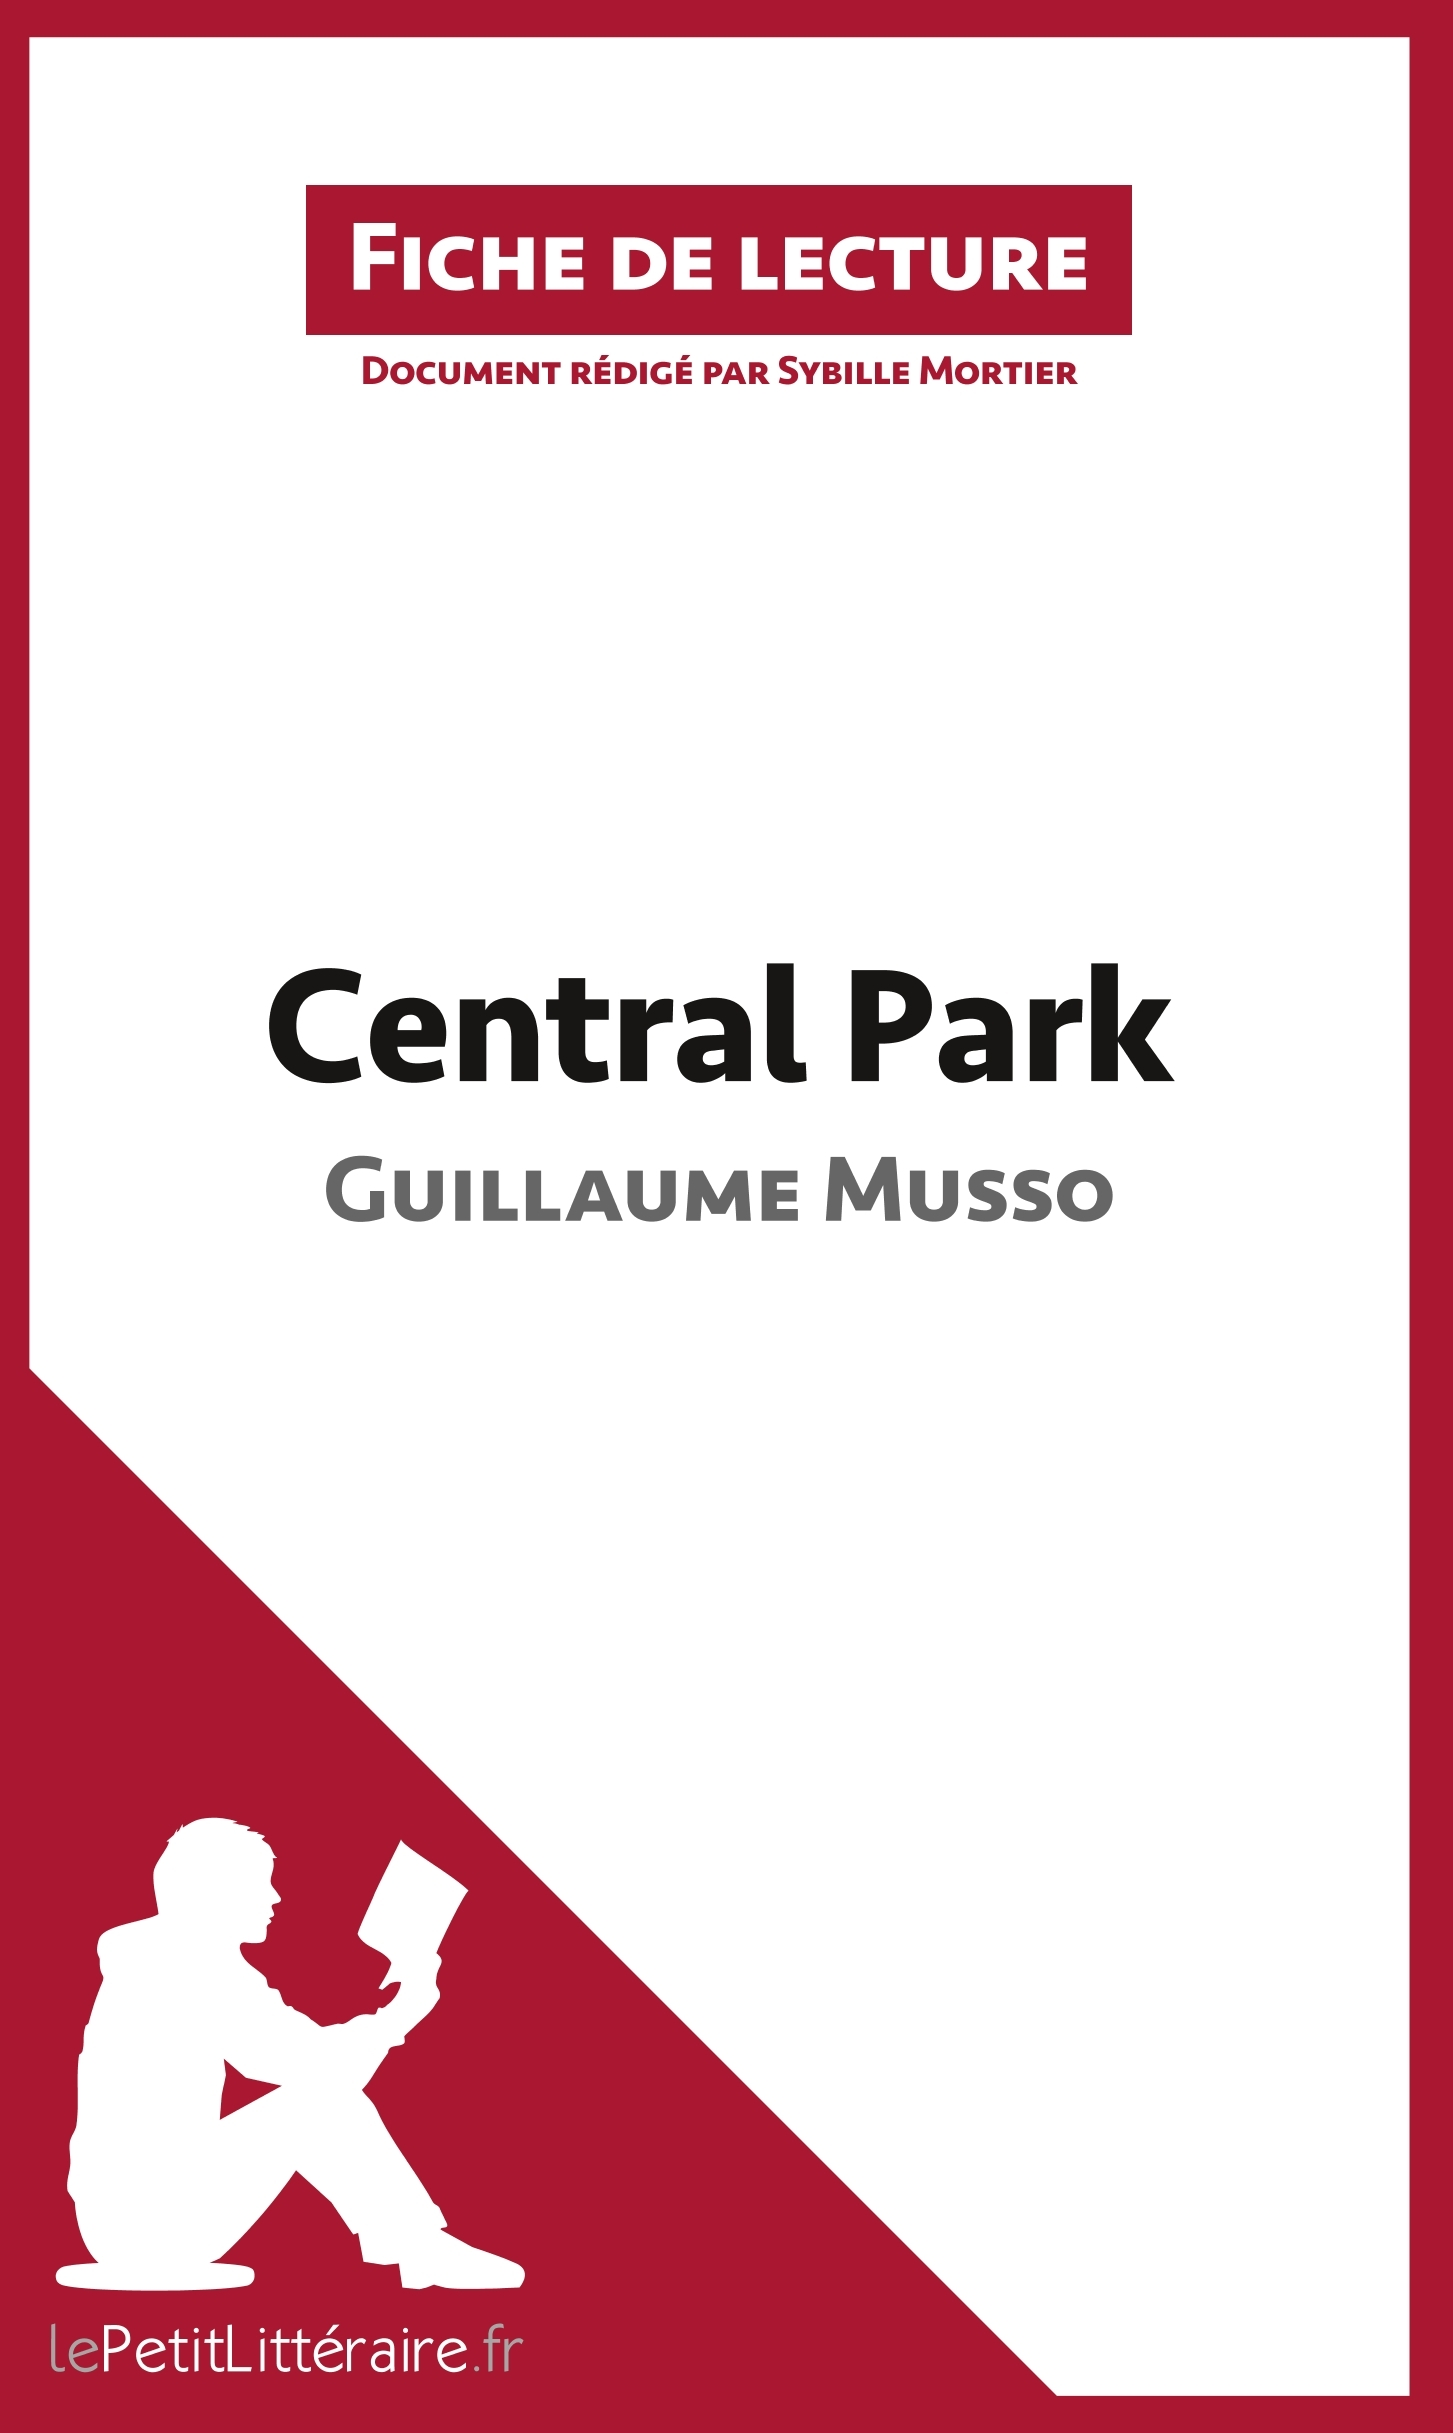 ANALYSE CENTRAL PARK DE GUILLAUME MUSSO ANALYSE COMPLETE DE L UVRE ET RESUME - RESUME COMPLET ET ANA